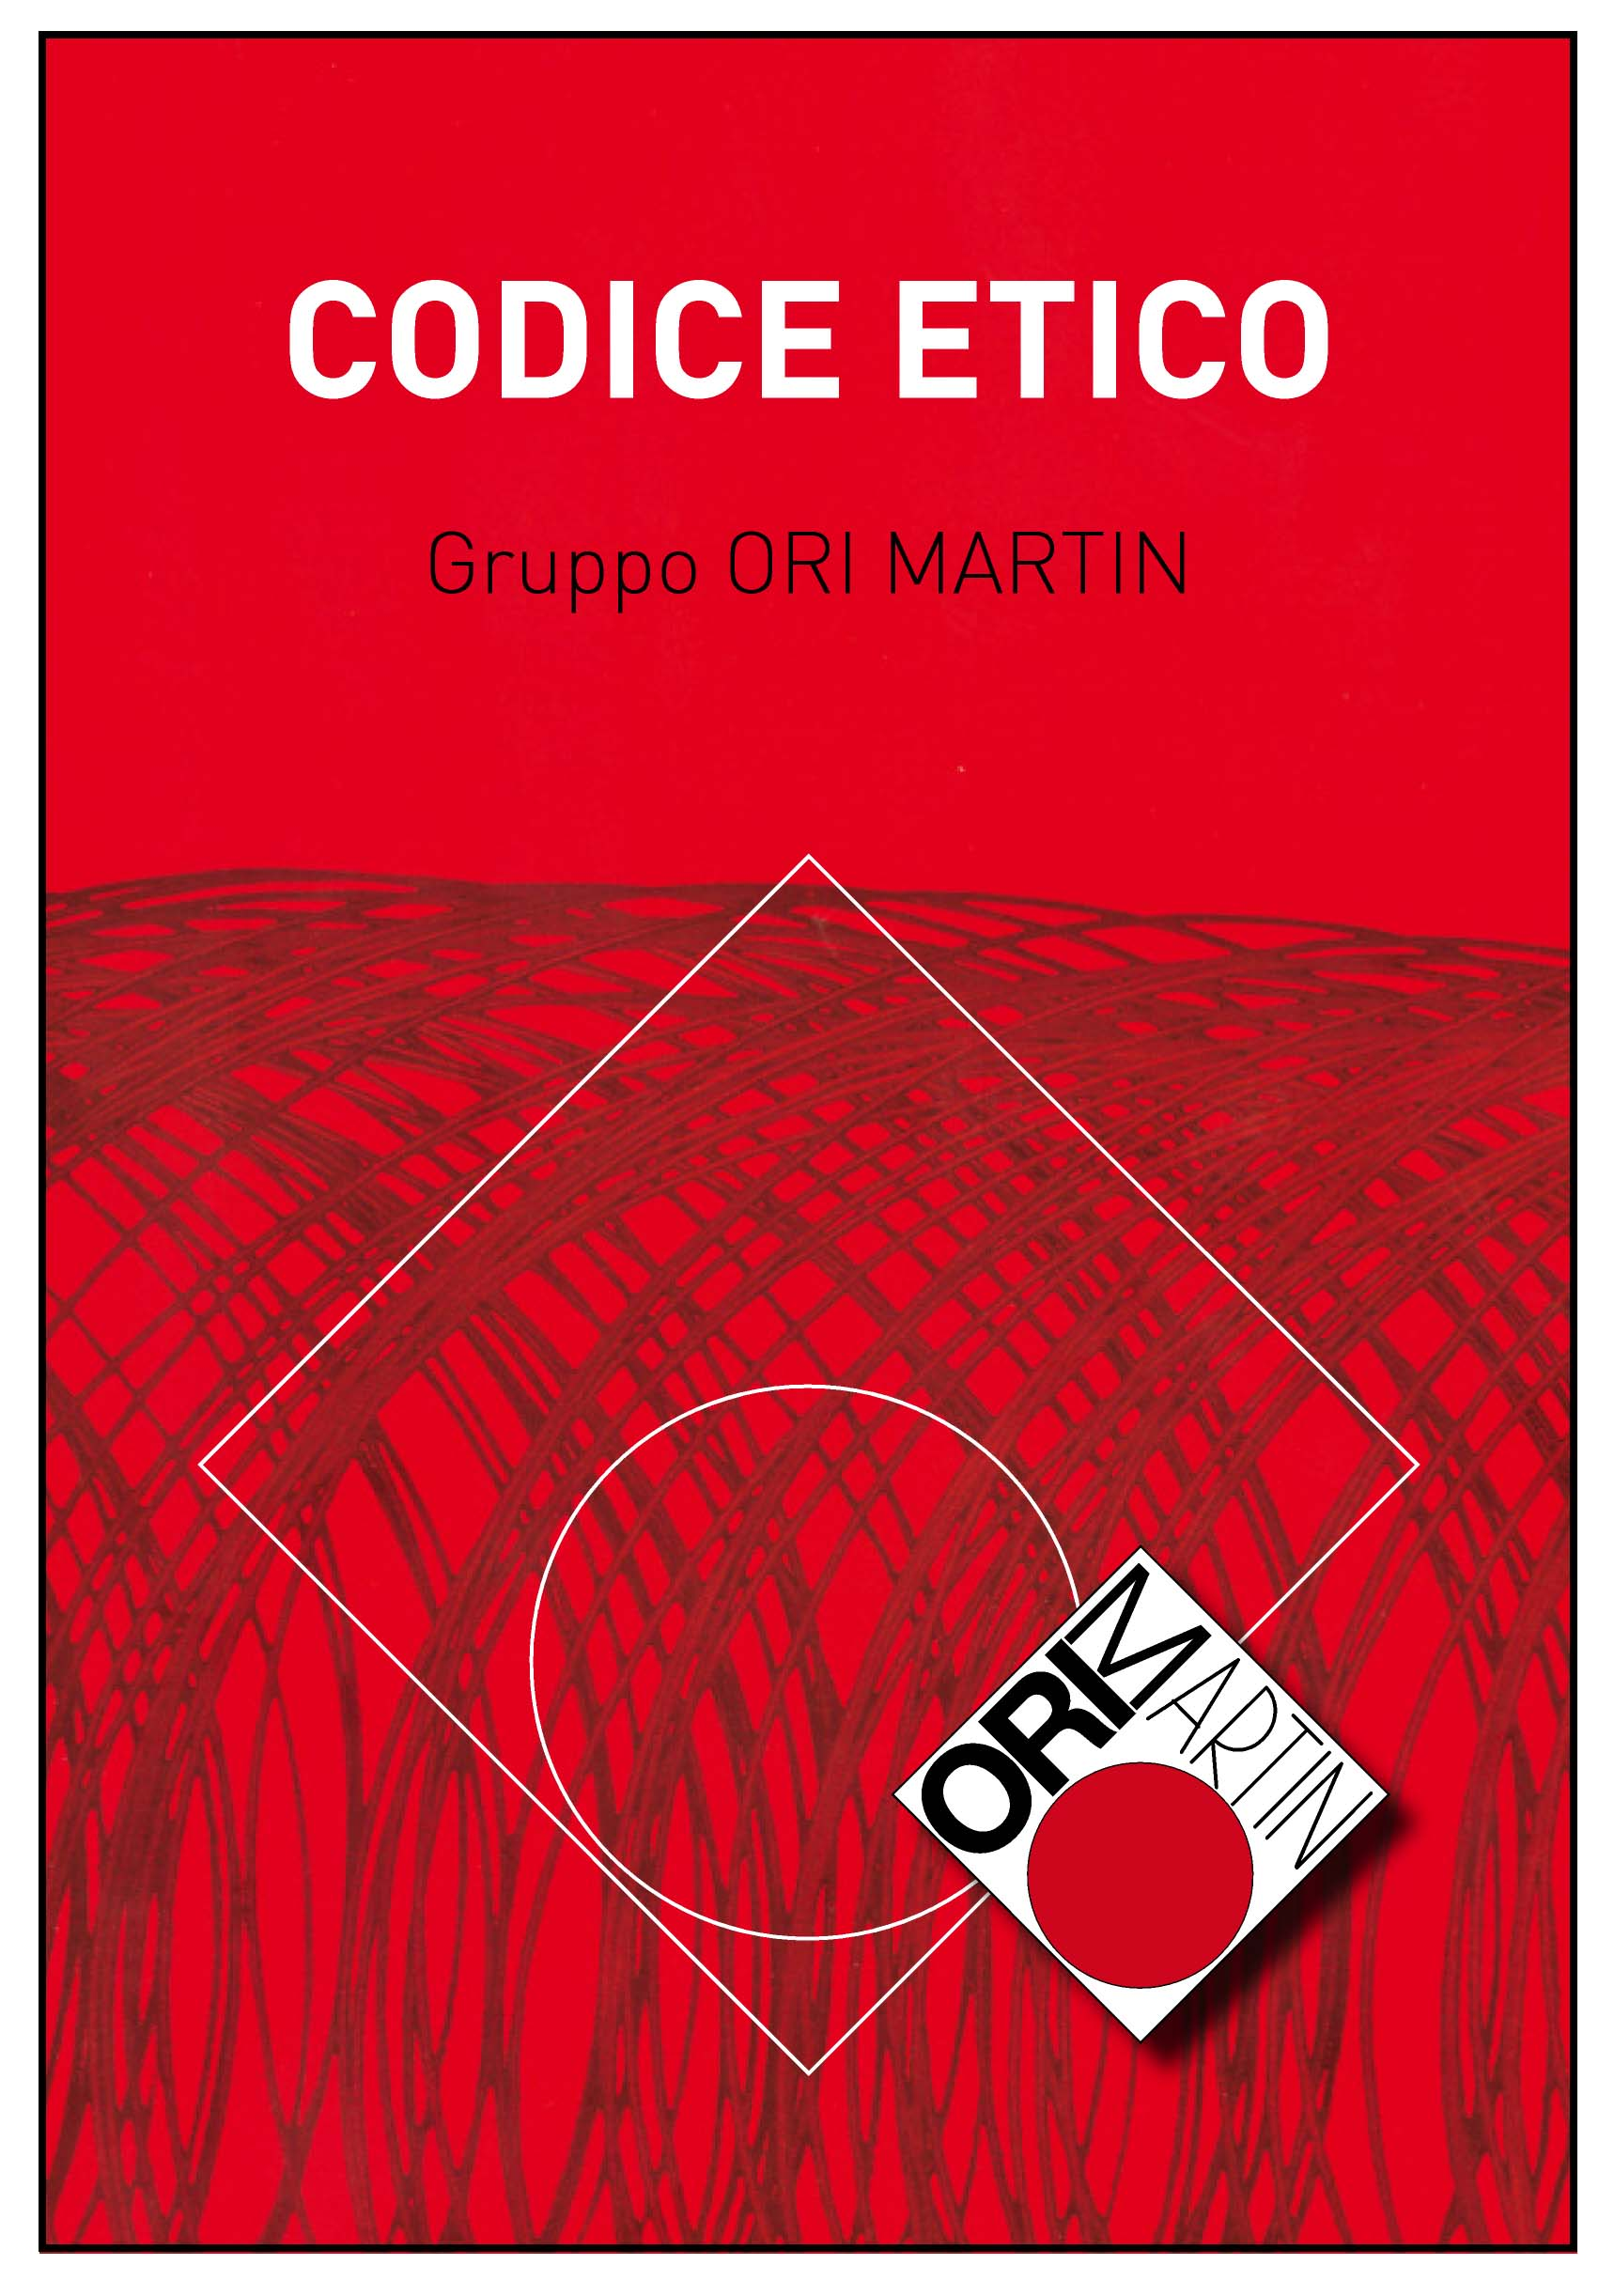 CodiceEticoOri.qxd